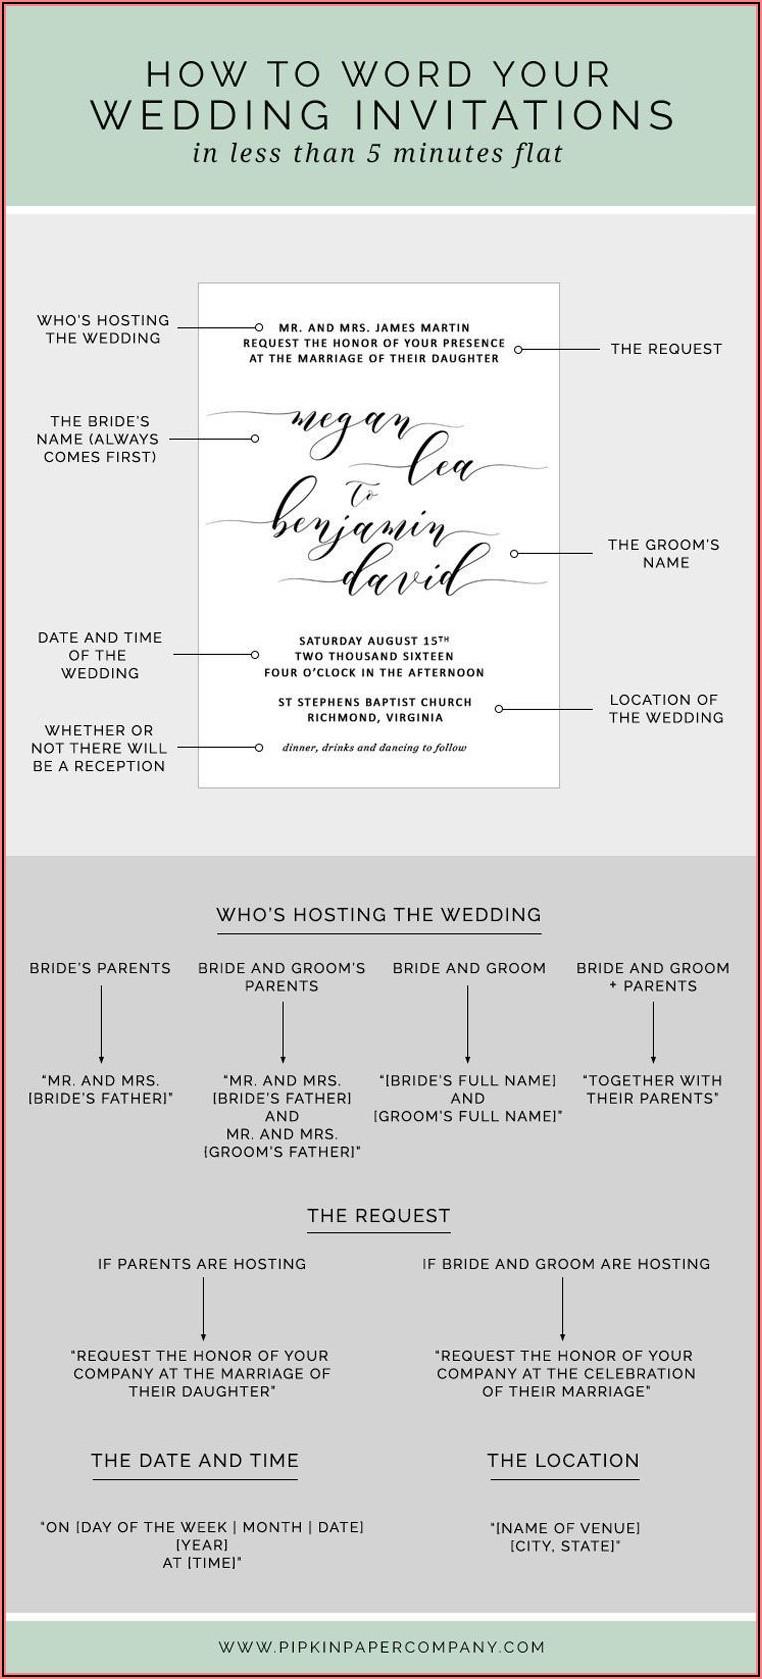 Wedding Invitation Wording Etiquette Both Parents Hosting